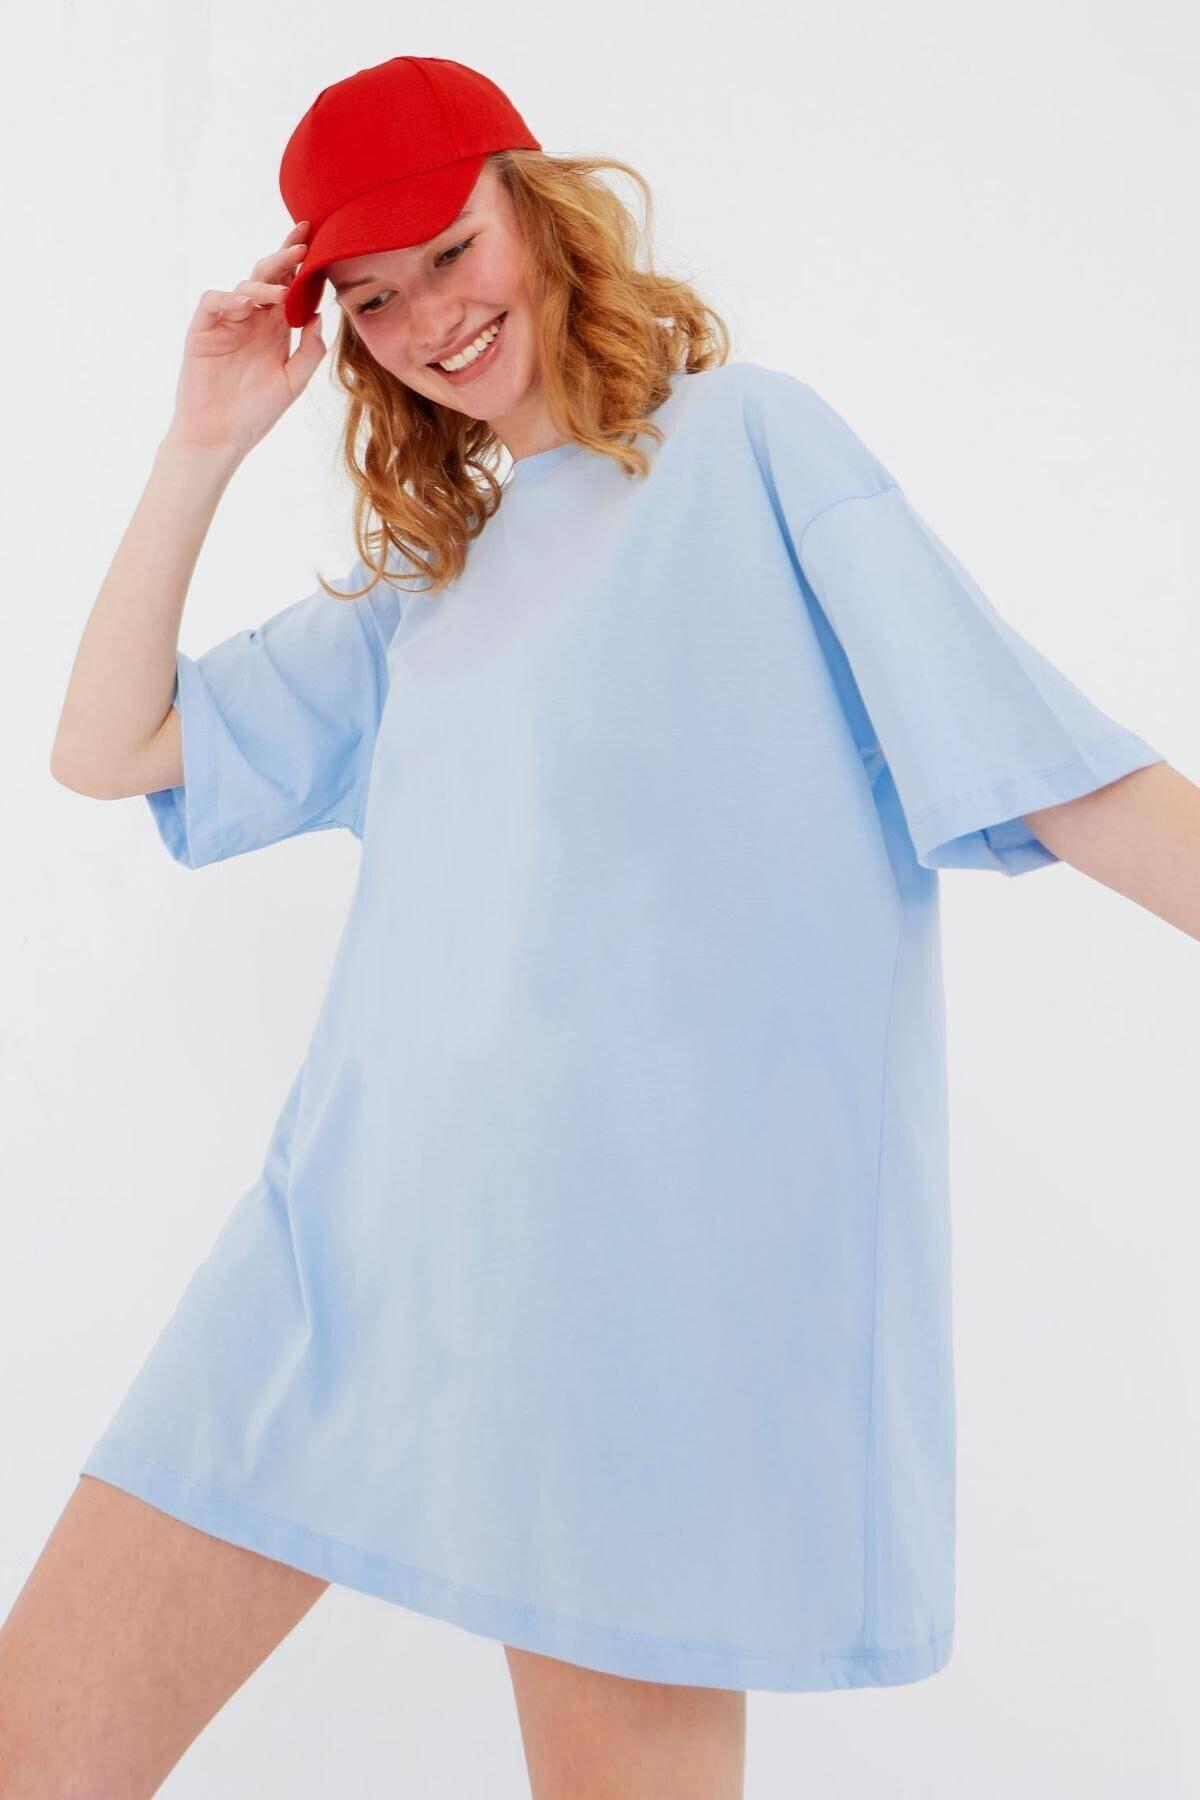 Addax Kadın Buz Mavi Oversize T-Shirt P0731 - G6K7 Adx-0000020596 0